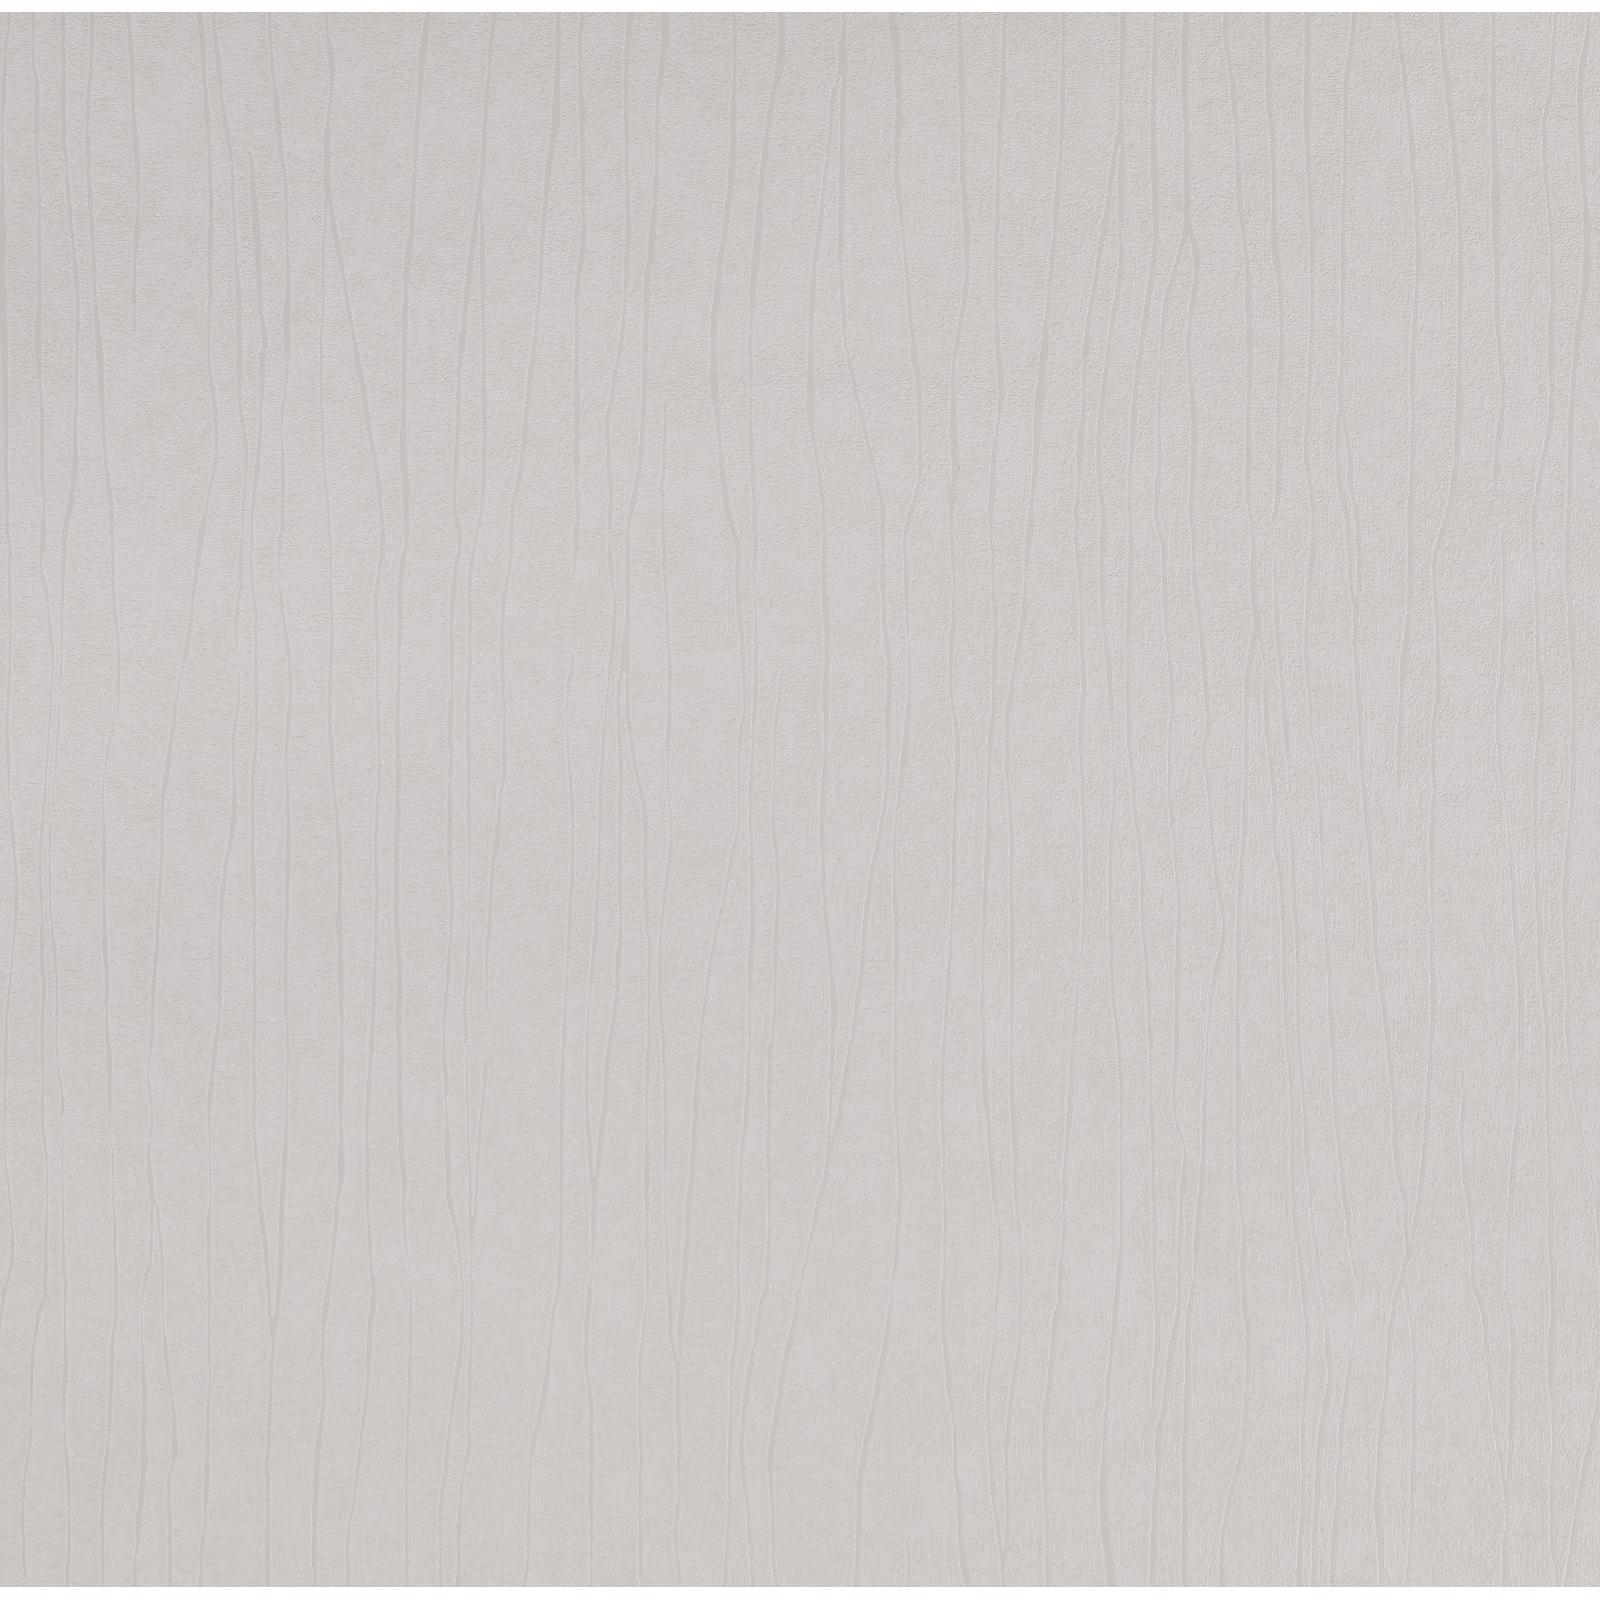 Superfresco Easy 52cm x 10m White Spun Silk Wallpaper